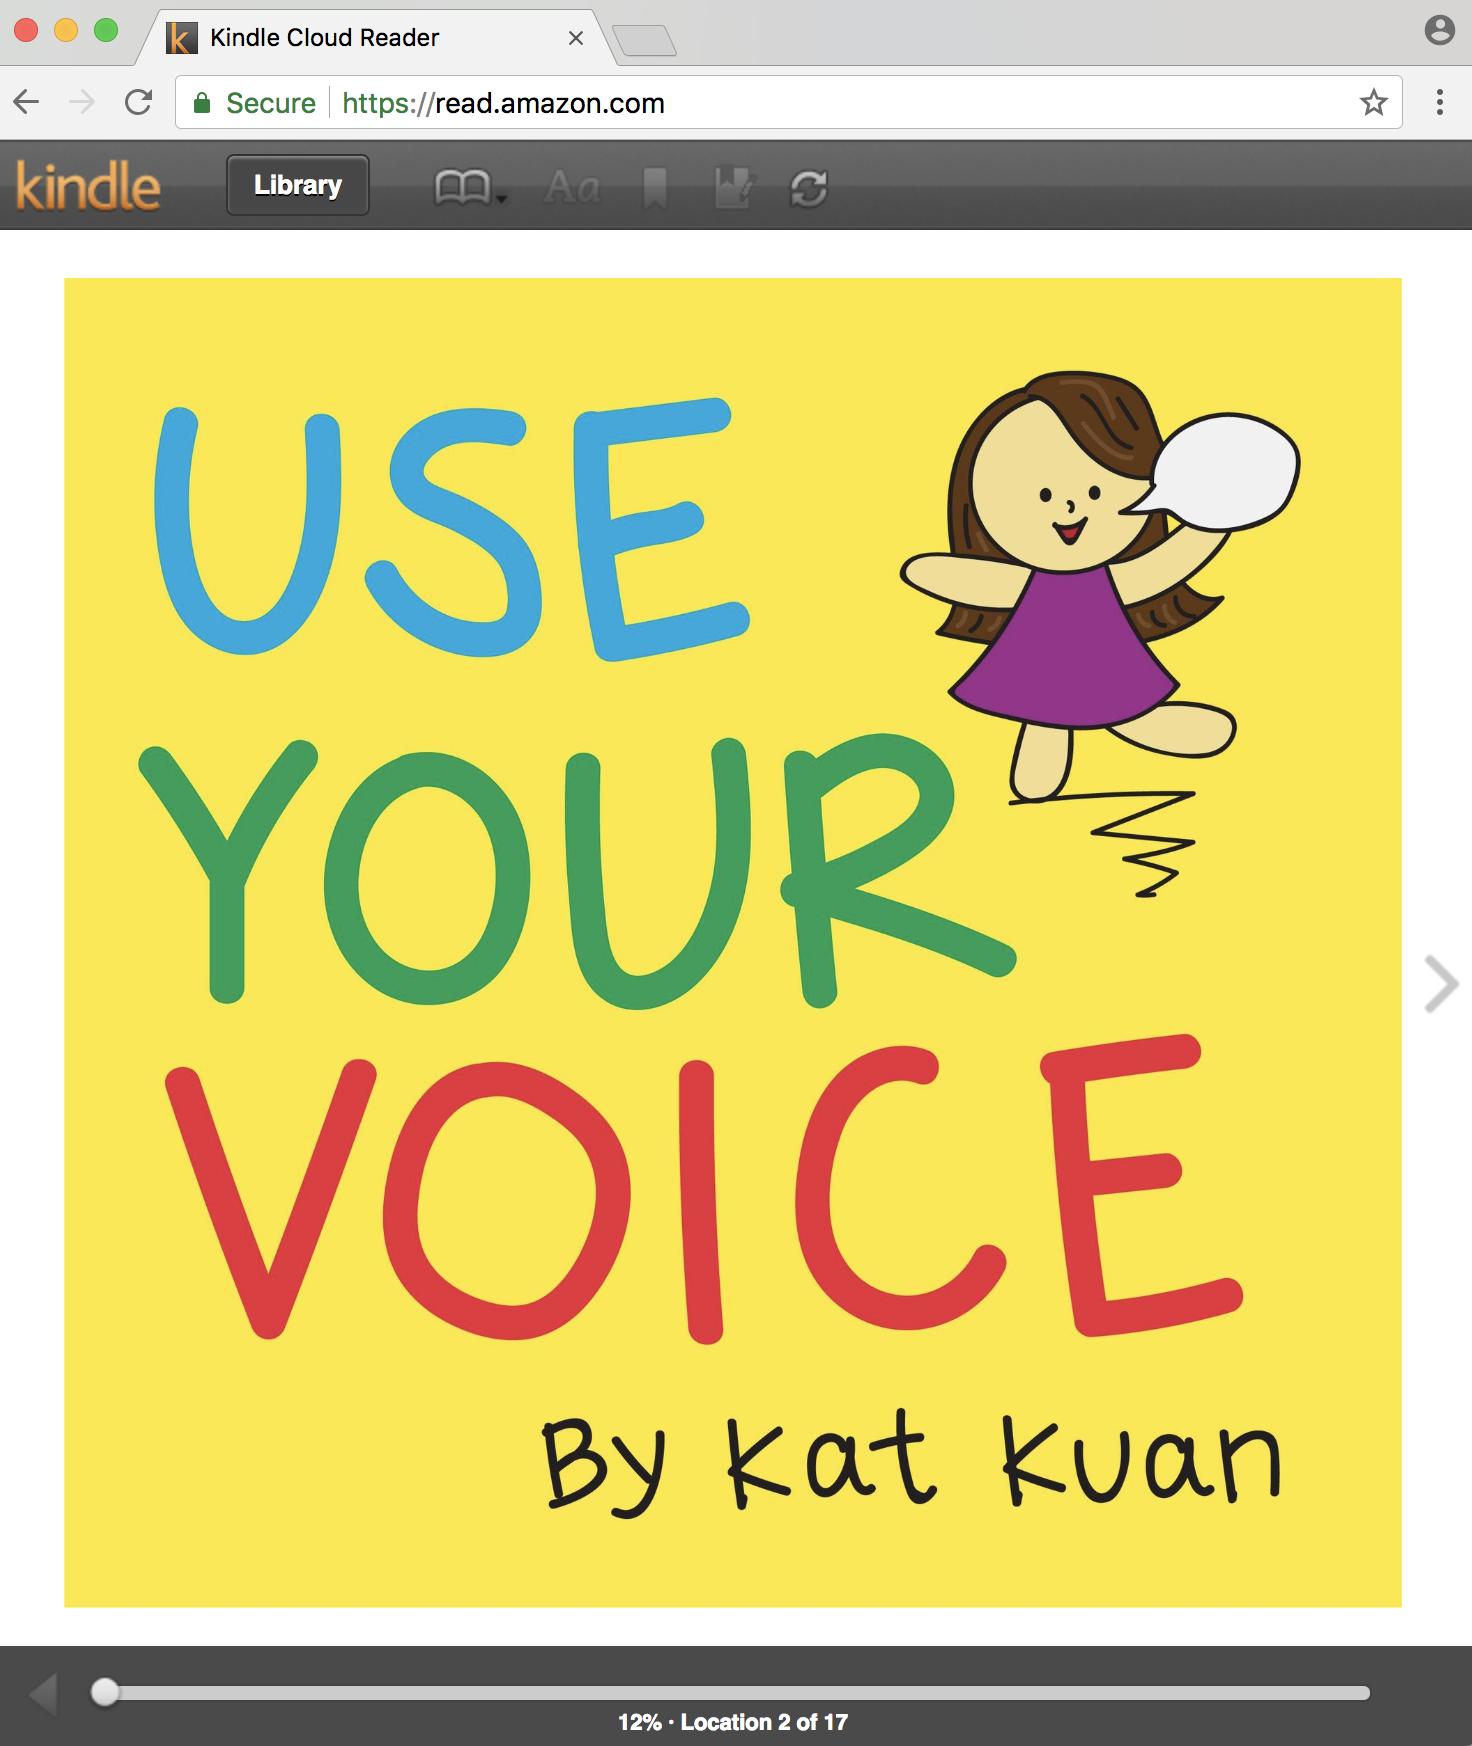 10 Steps to Create an Awesome Amazon Kindle eBook